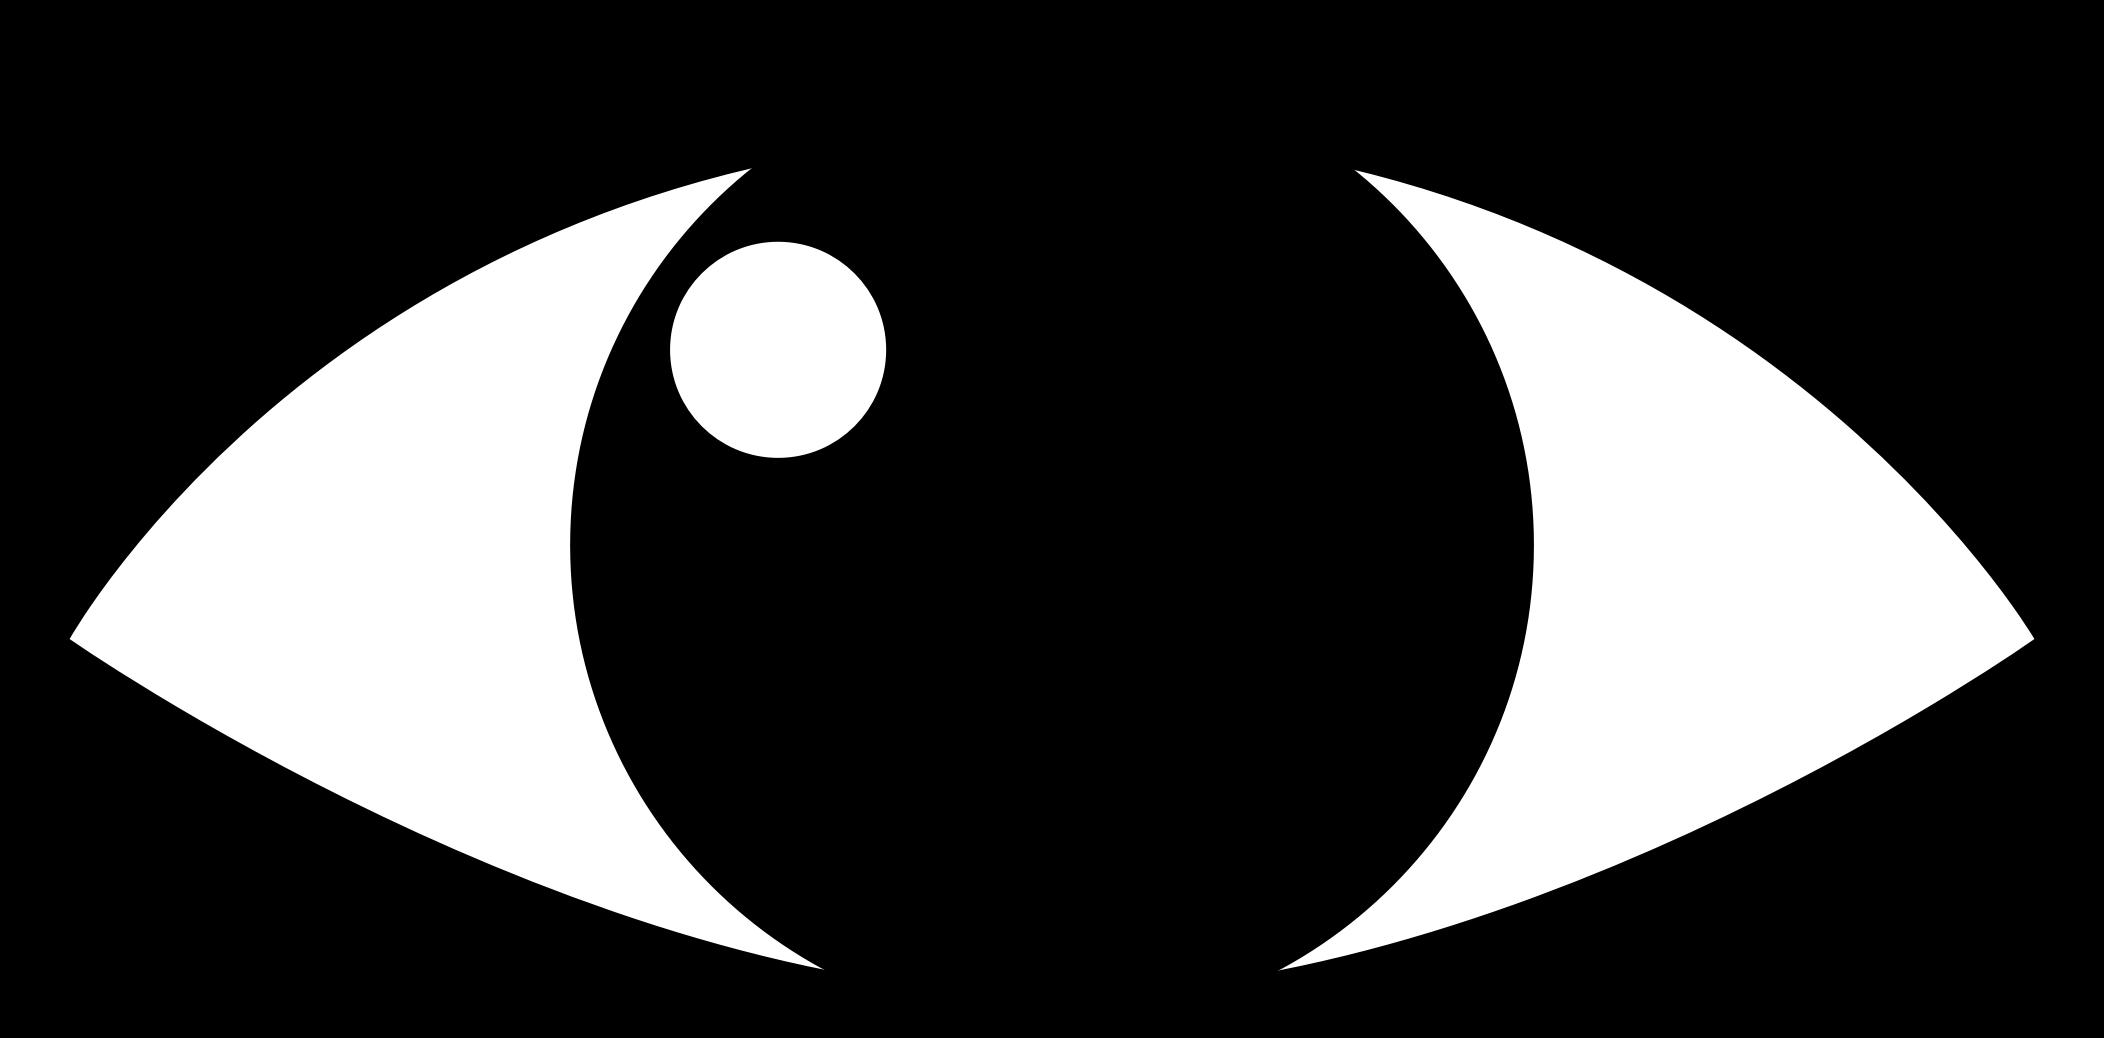 Eye clipart #10, Download drawings